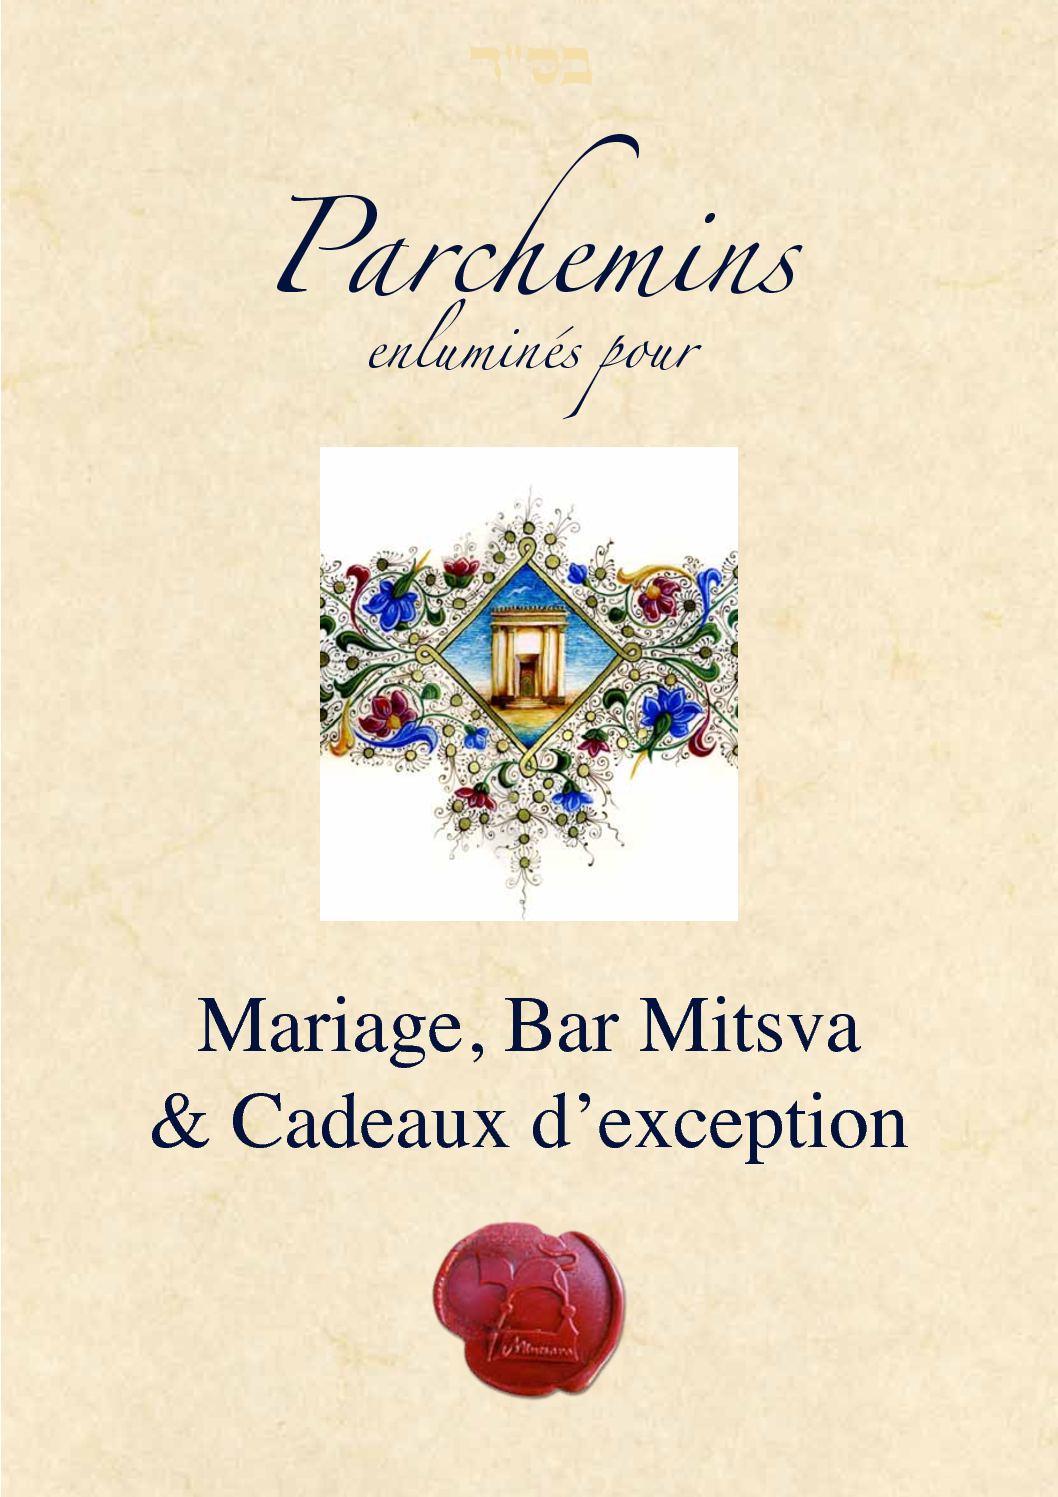 Mariage & Bar Mitsva